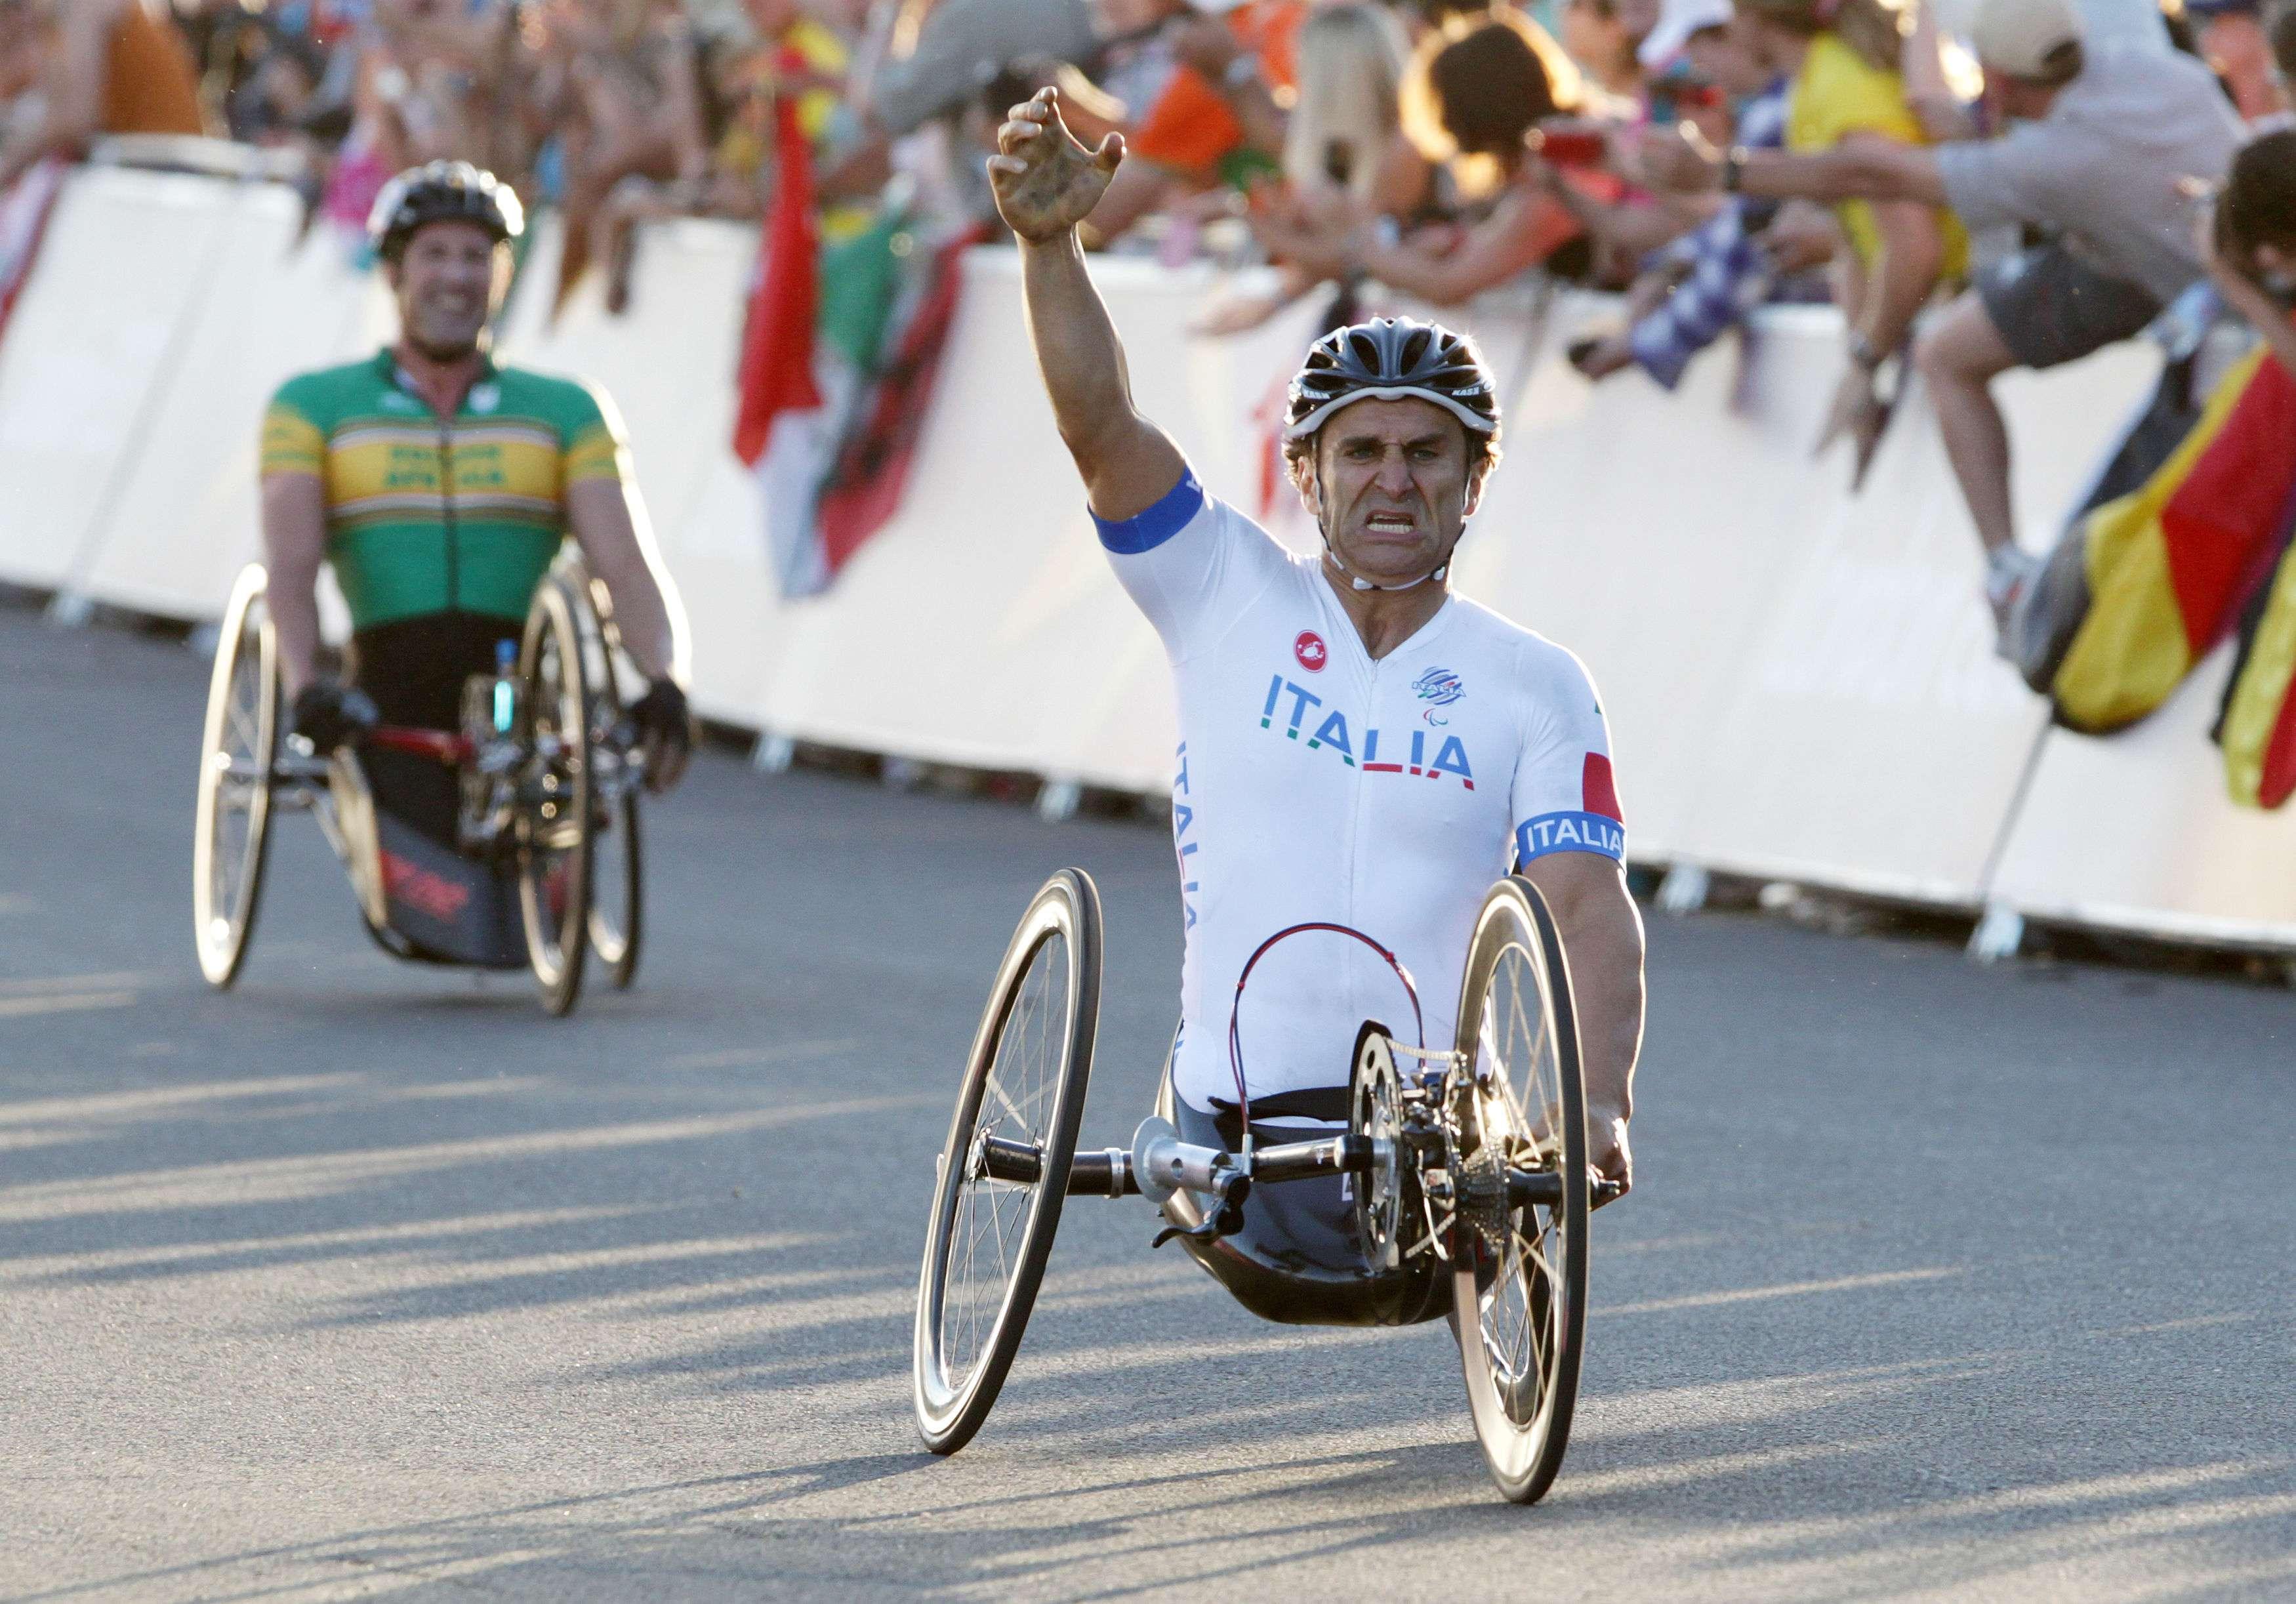 Alex Zanardi vive un final agridulce en los Paralímpicos